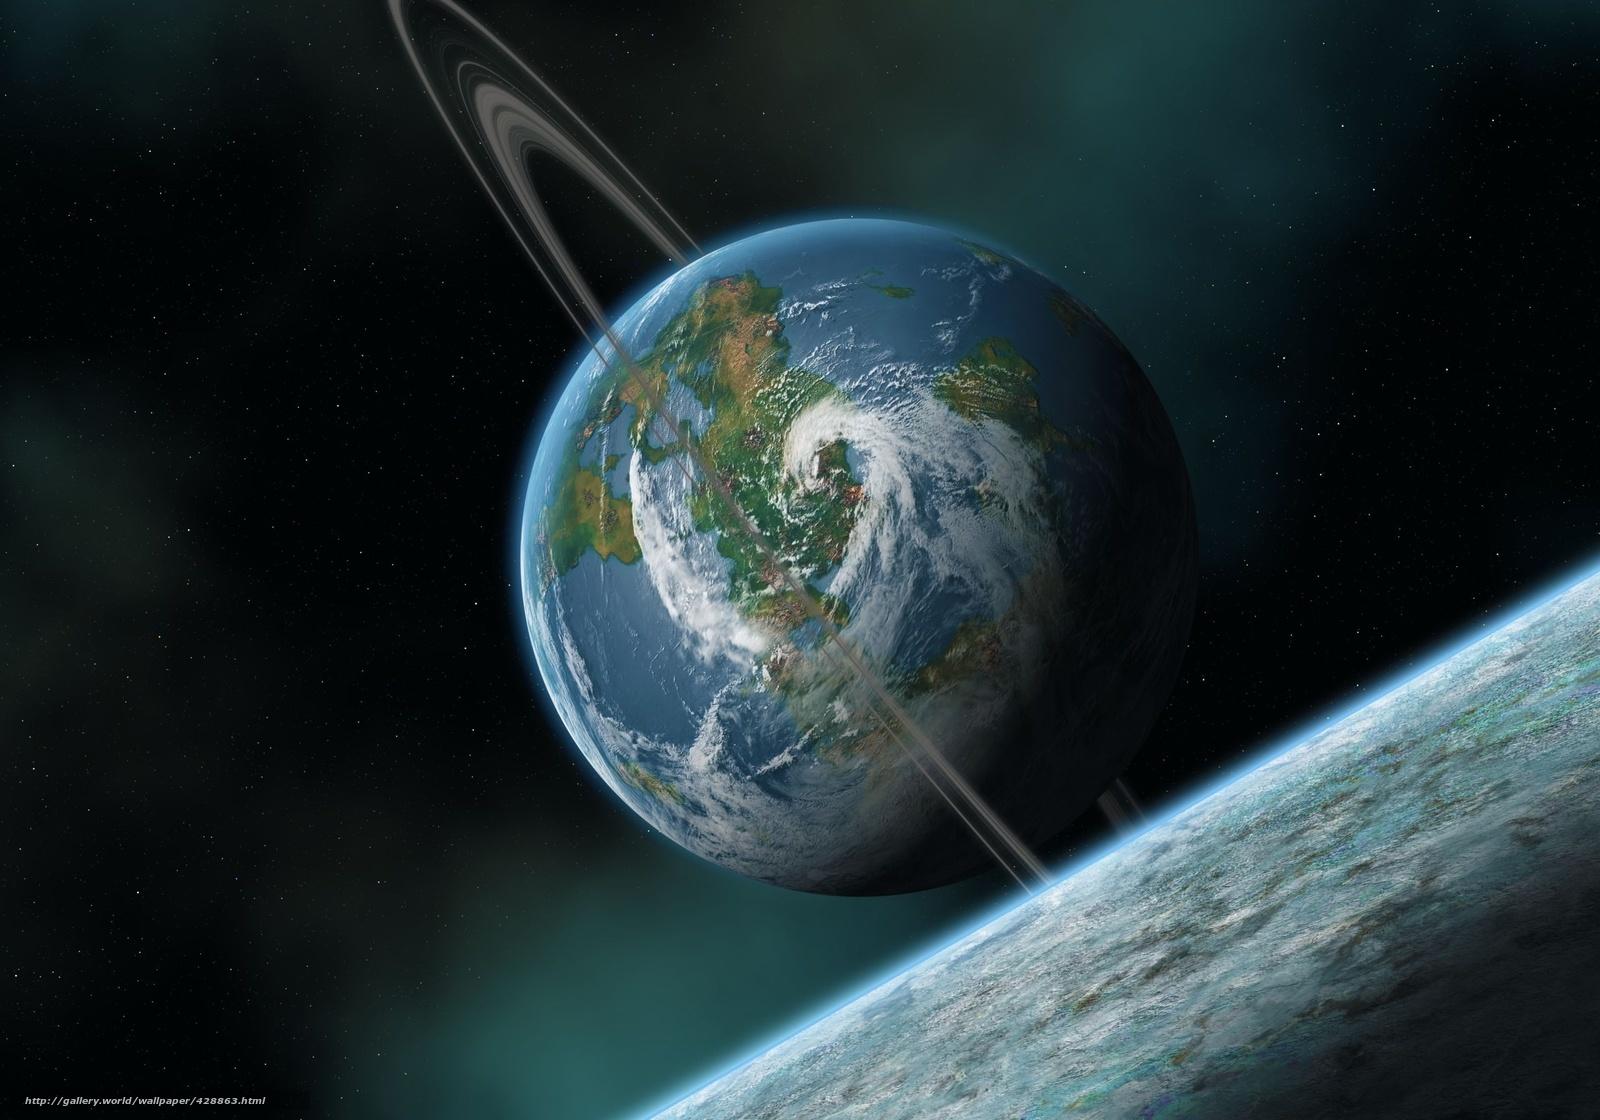 Скачать на телефон обои фото картинку на тему Спутник, луна, атмосфера, облака, циклон, море, вода, разширение 2560x1792